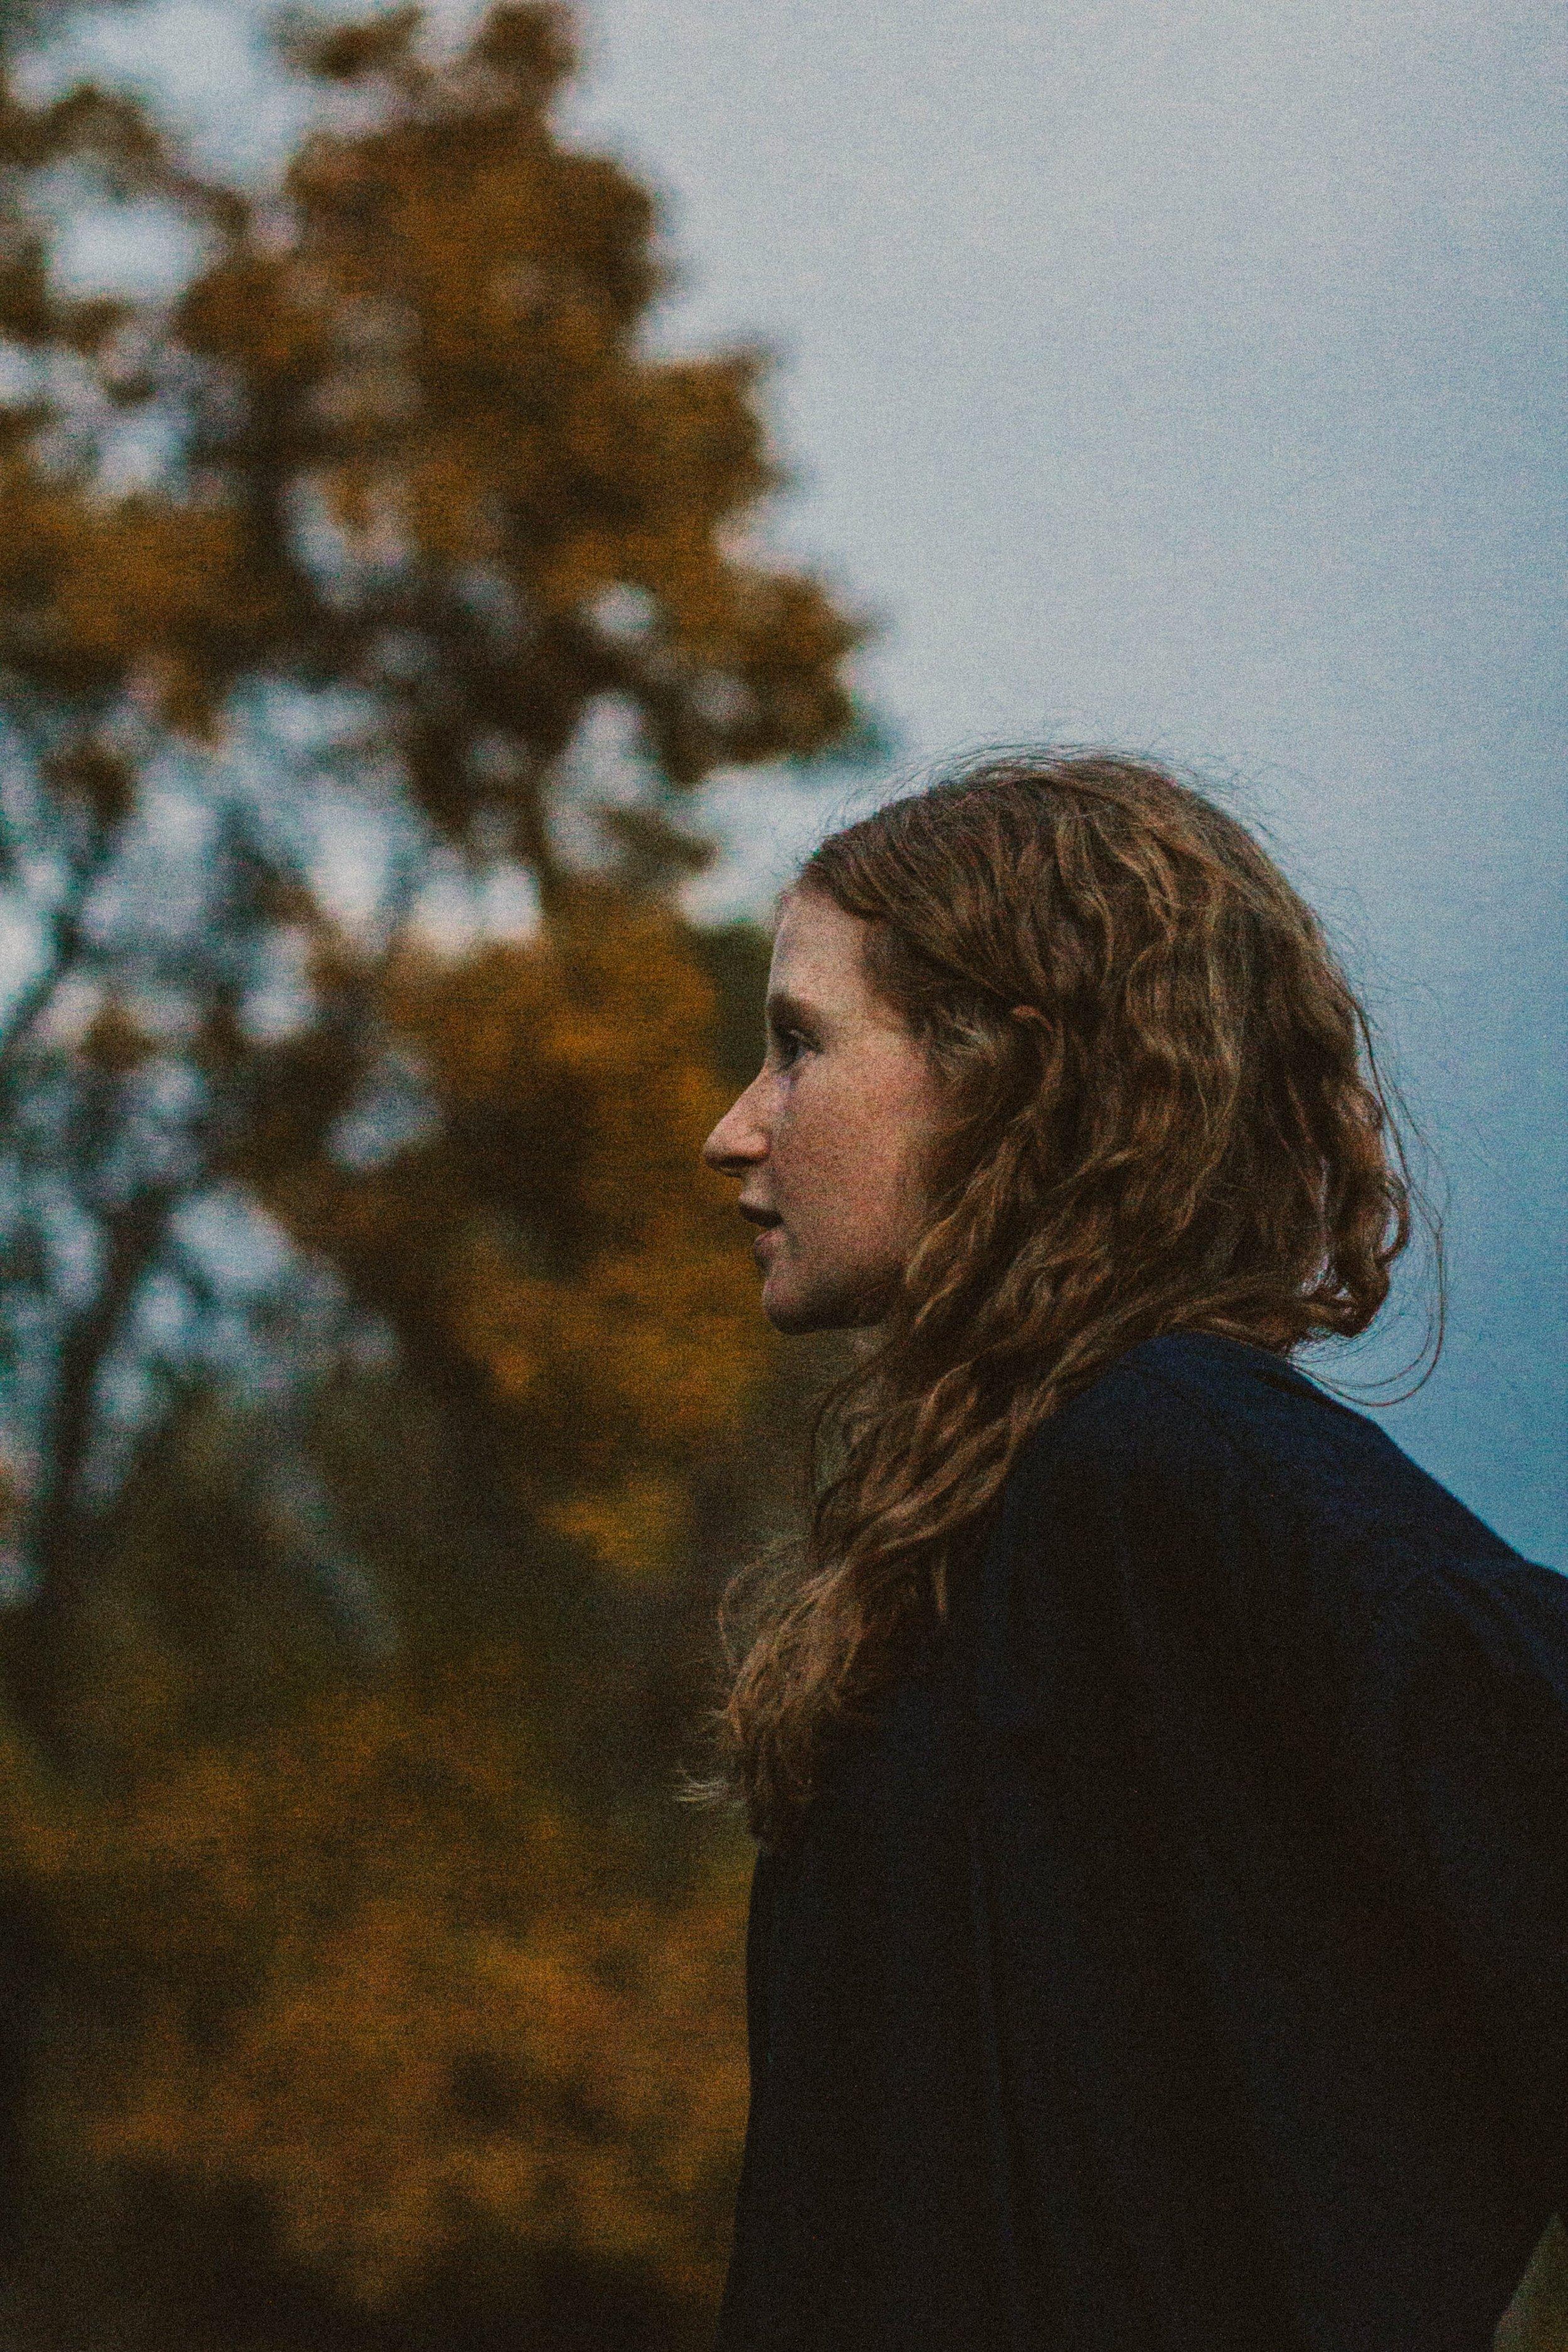 Photograph by Julia Morgan